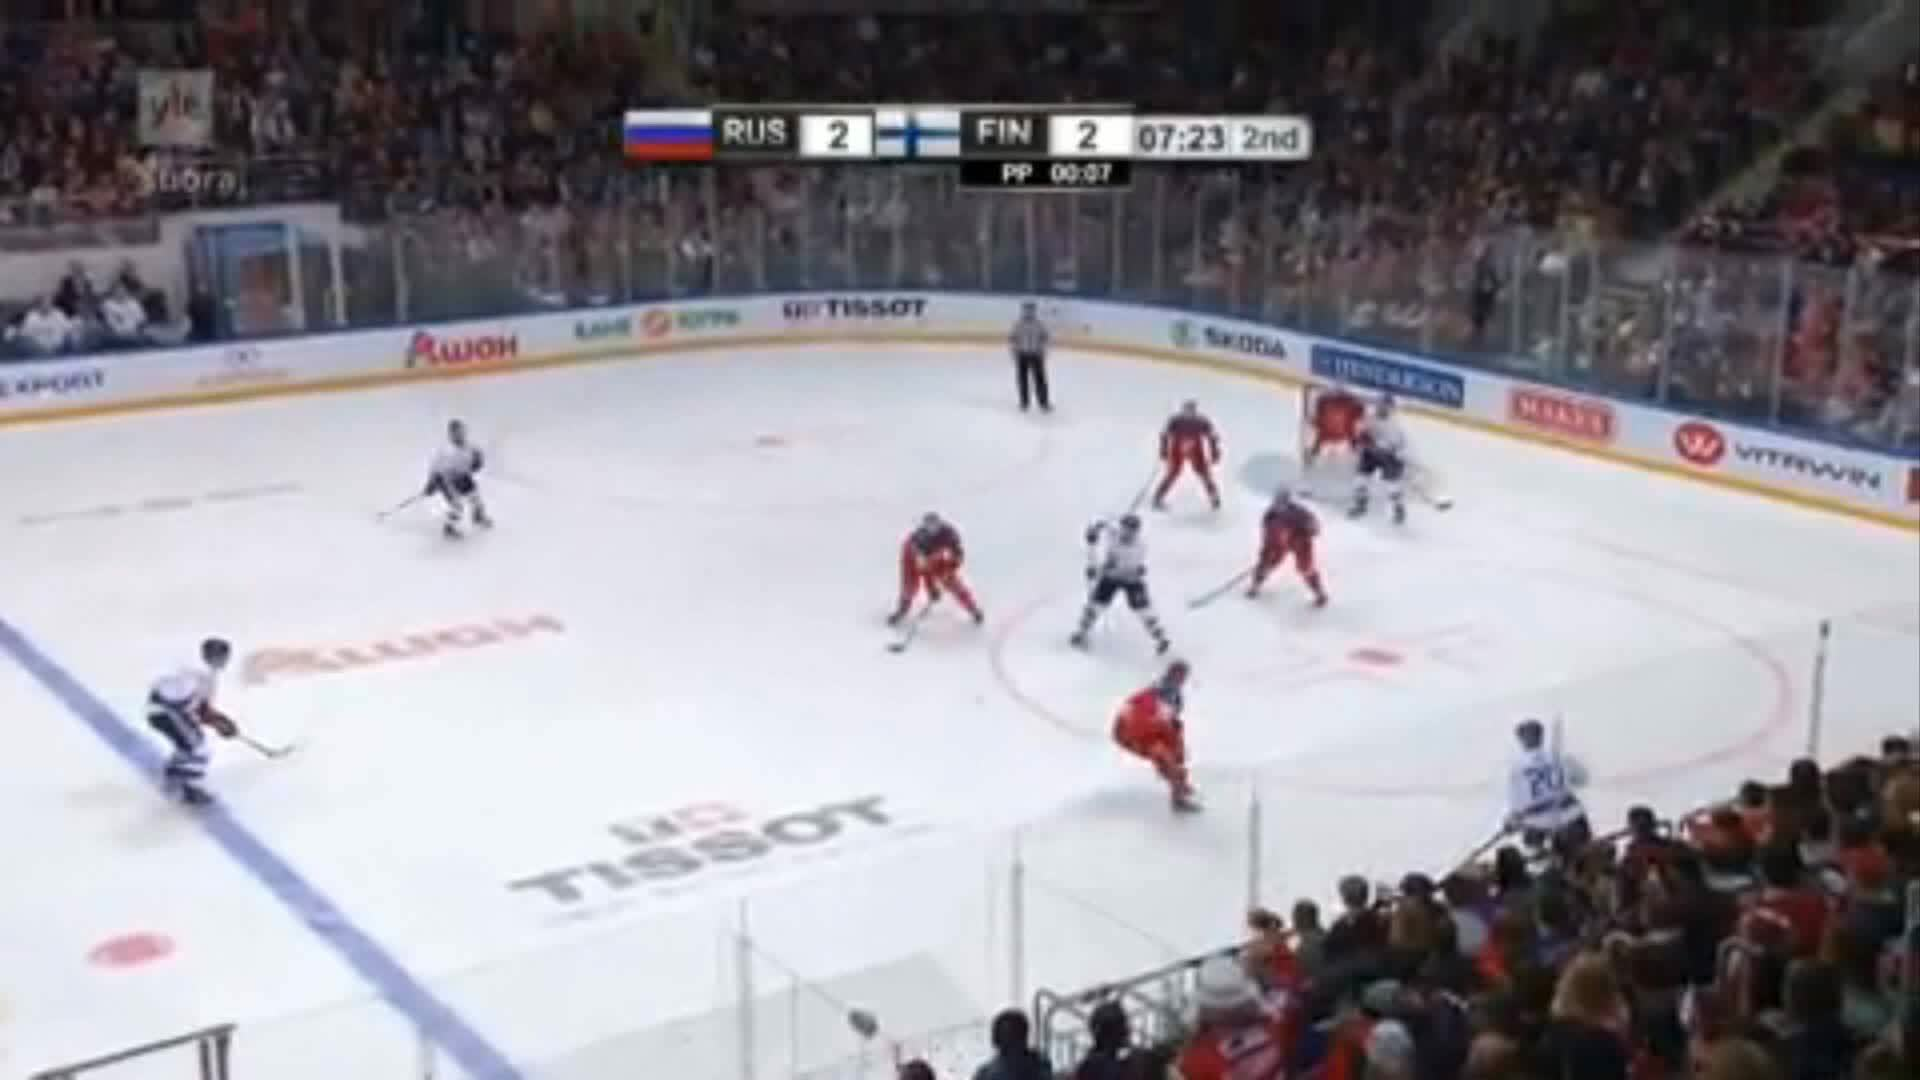 Hockey, hockey, imagesofrussia, EHT Russia-Finland 2-3 Pulkkinen GIFs